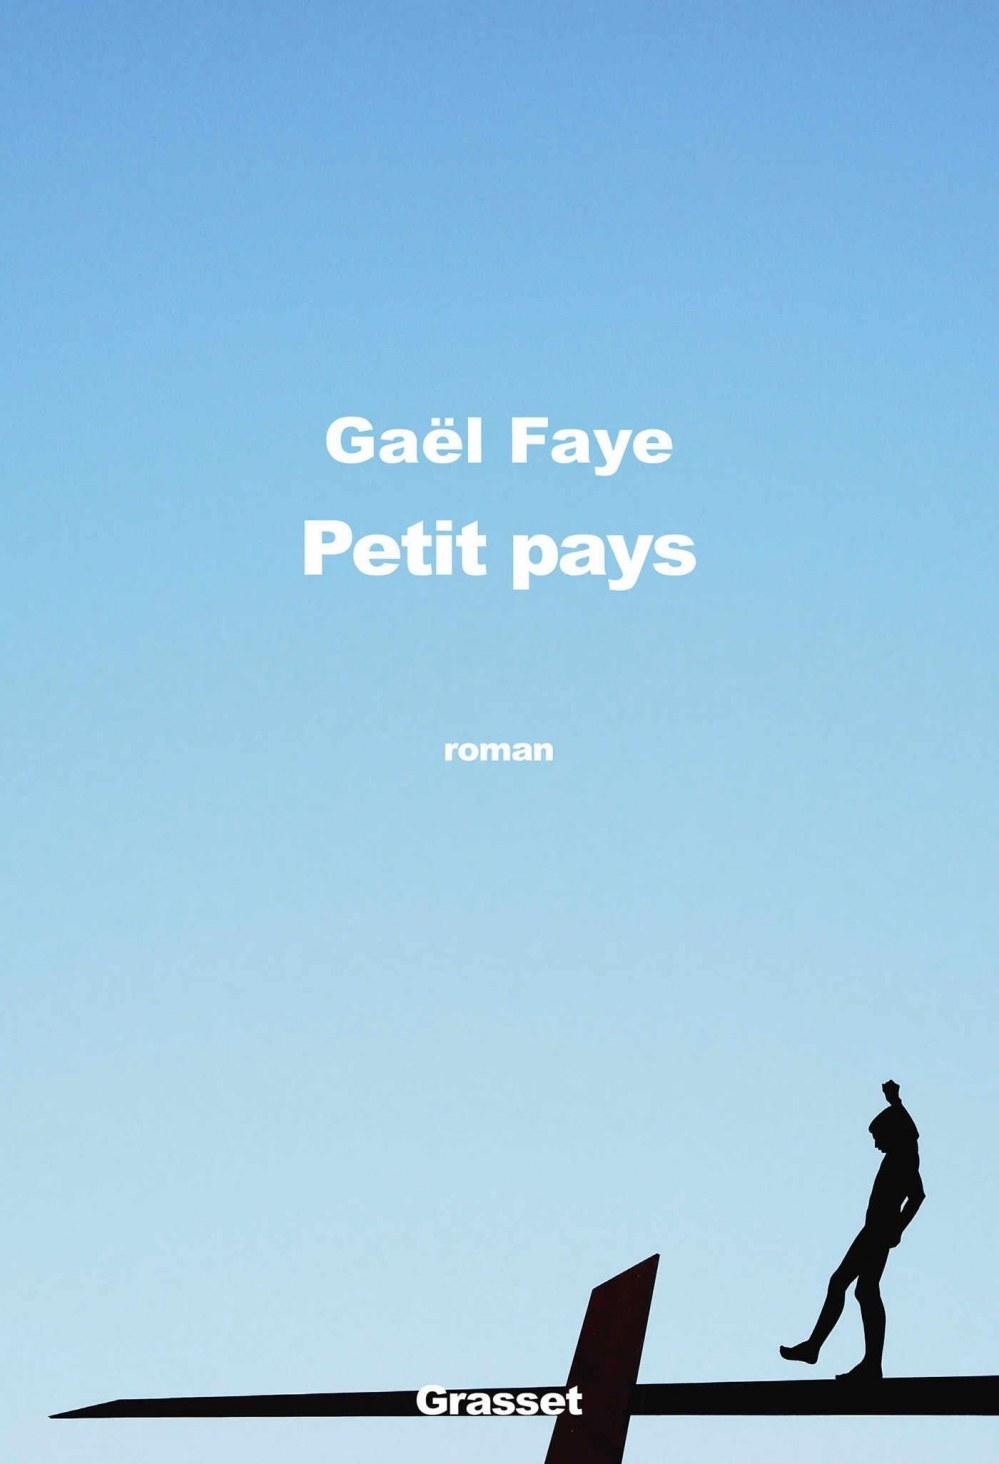 gael faye petit pays bibliolingus blog livre